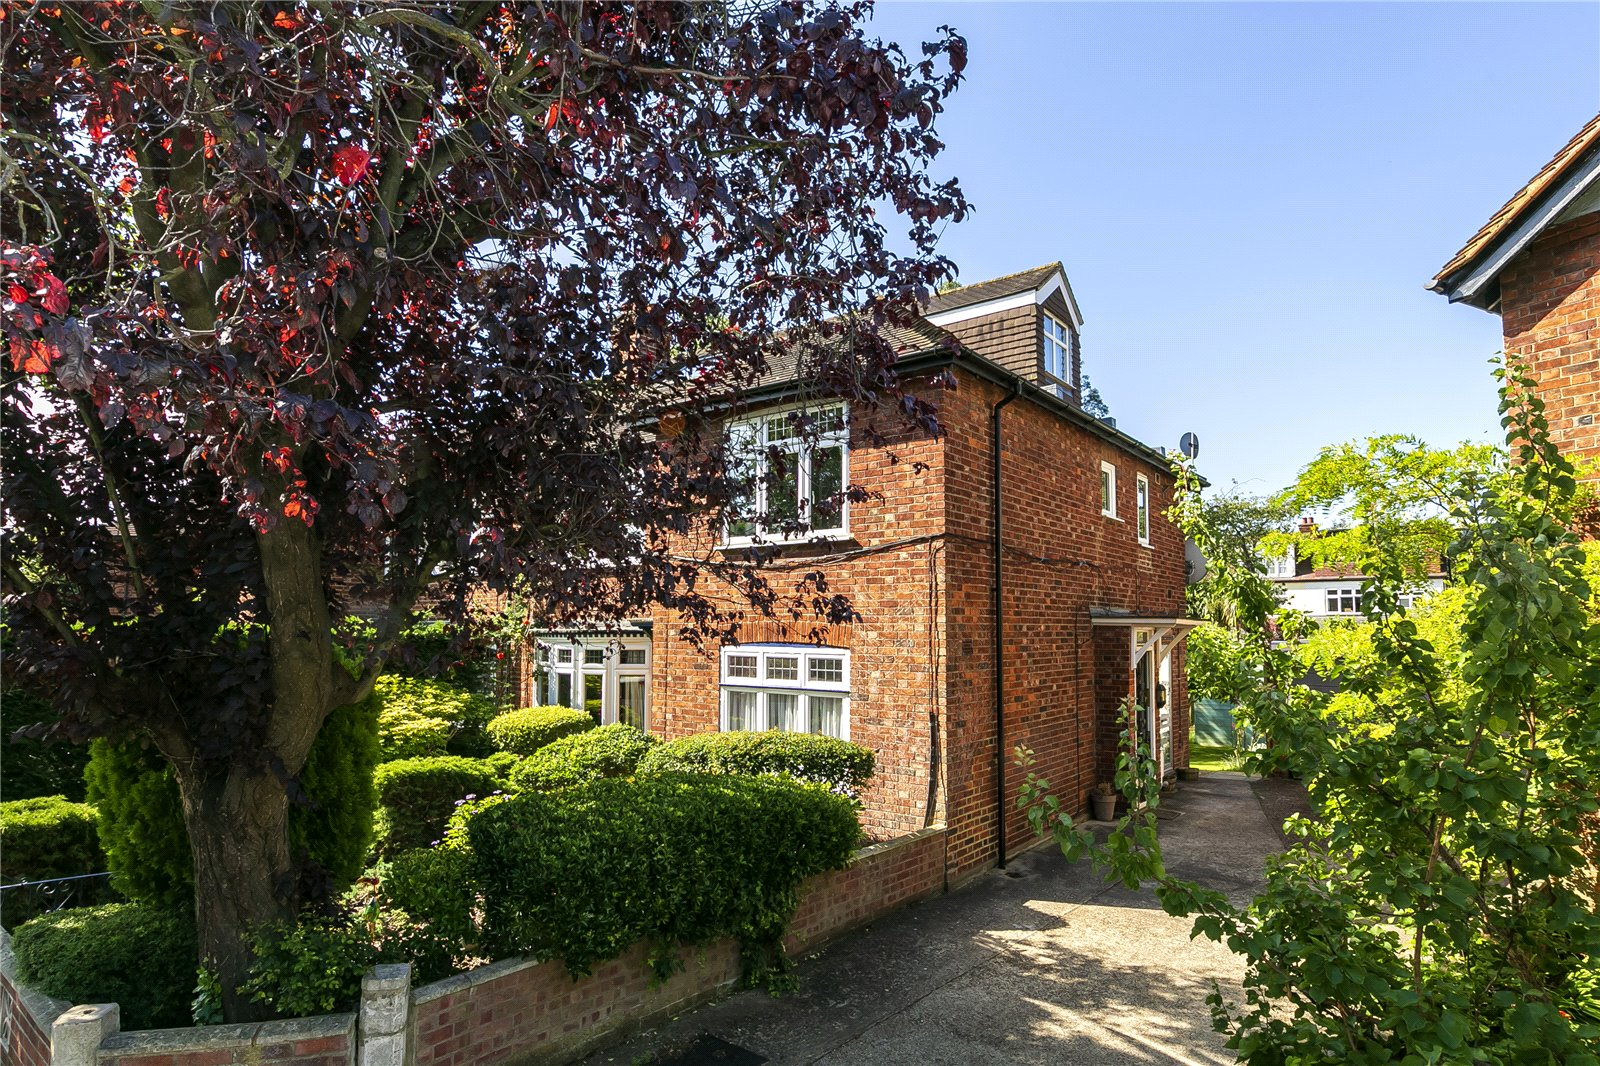 Courtlands Avenue, Kew, TW9 4EP - Antony Roberts